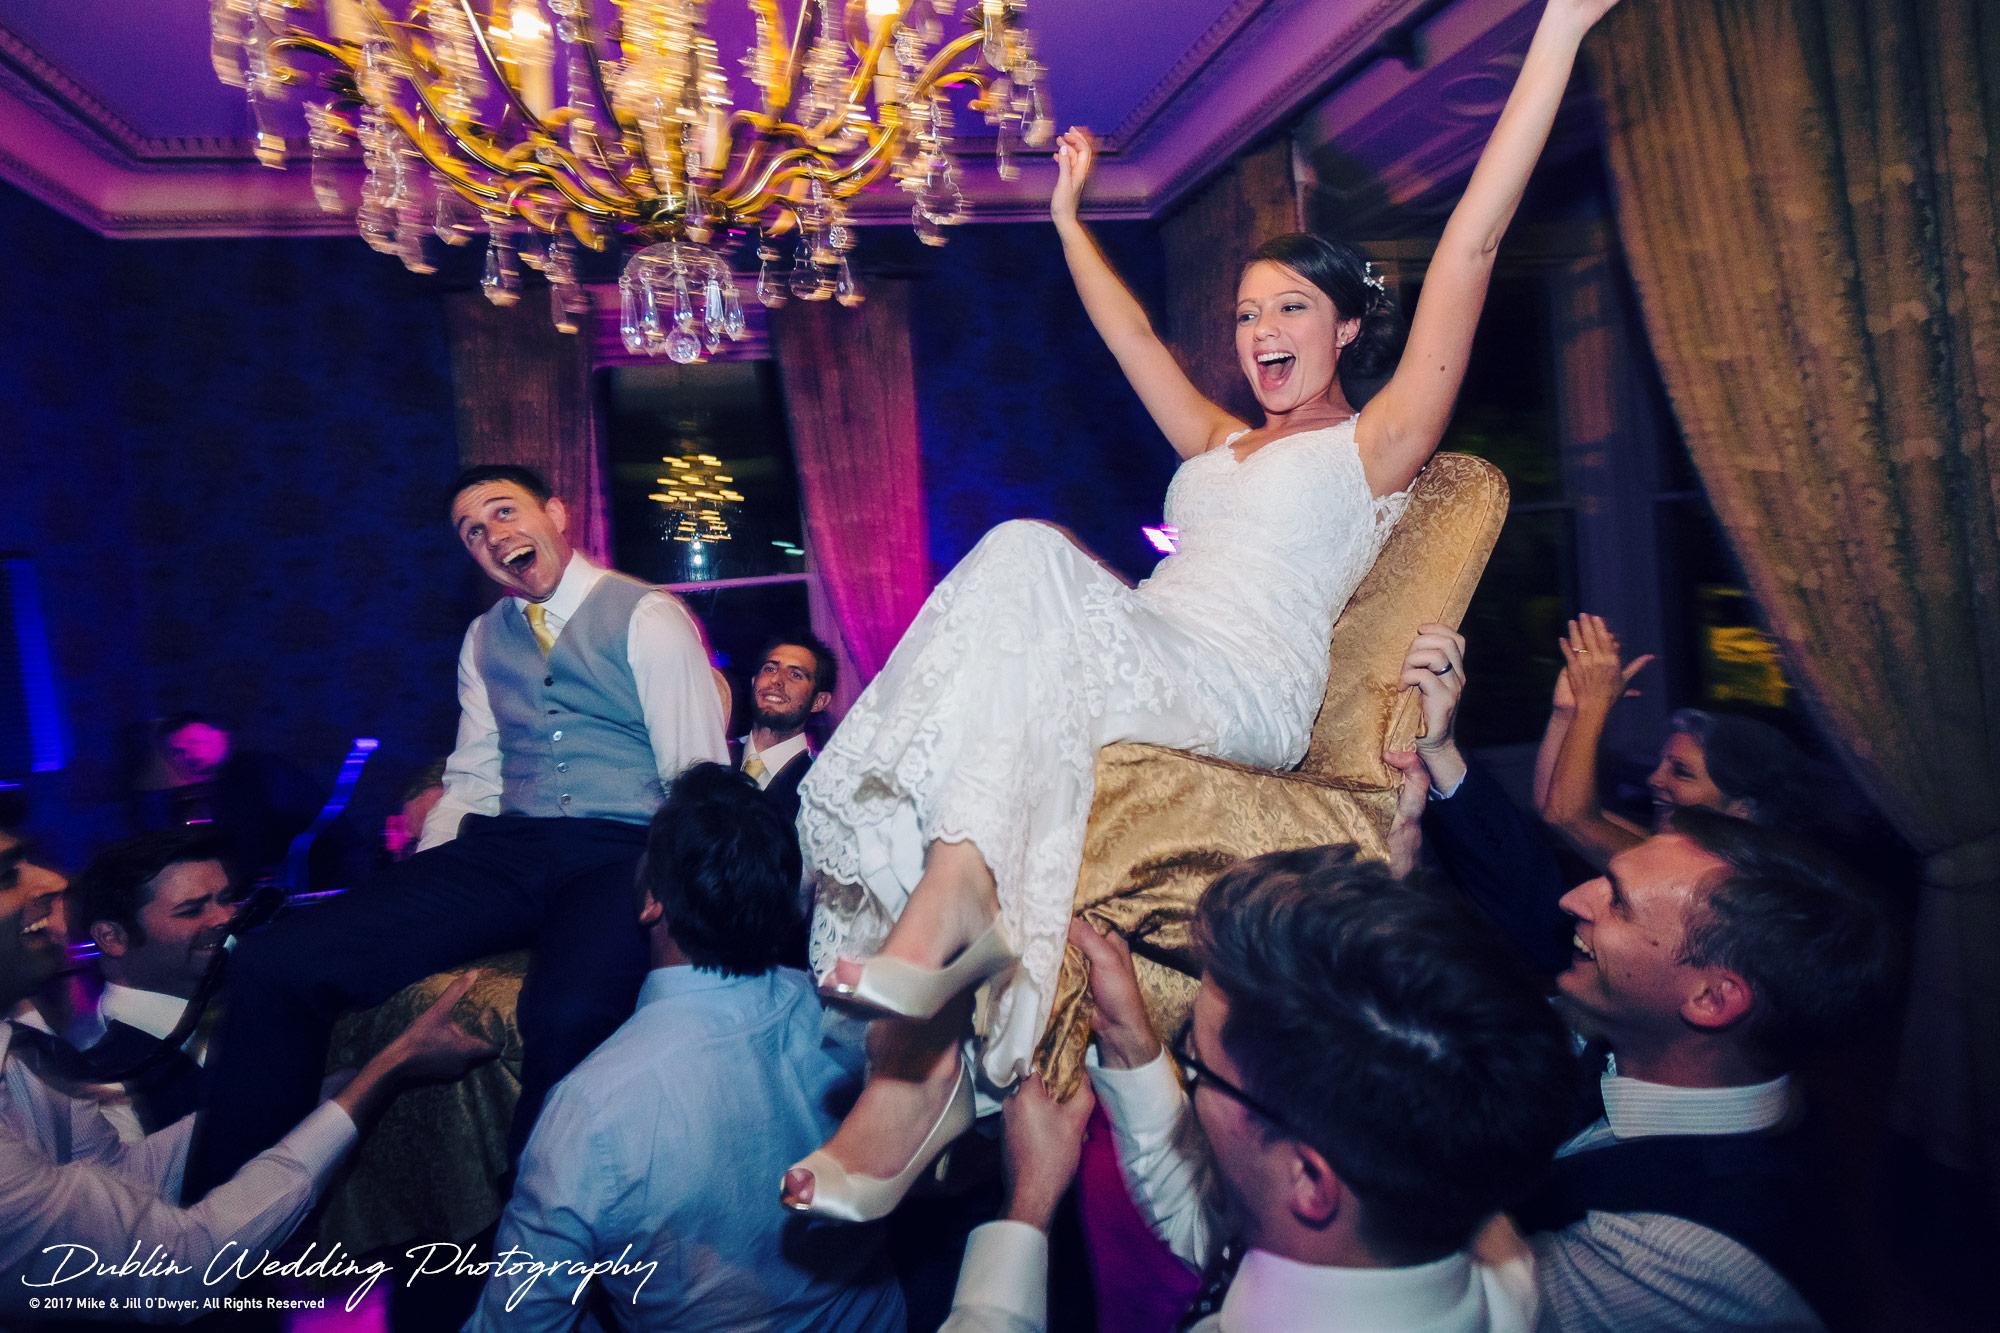 Ariel & Chris Hora dance for Bride & Groom